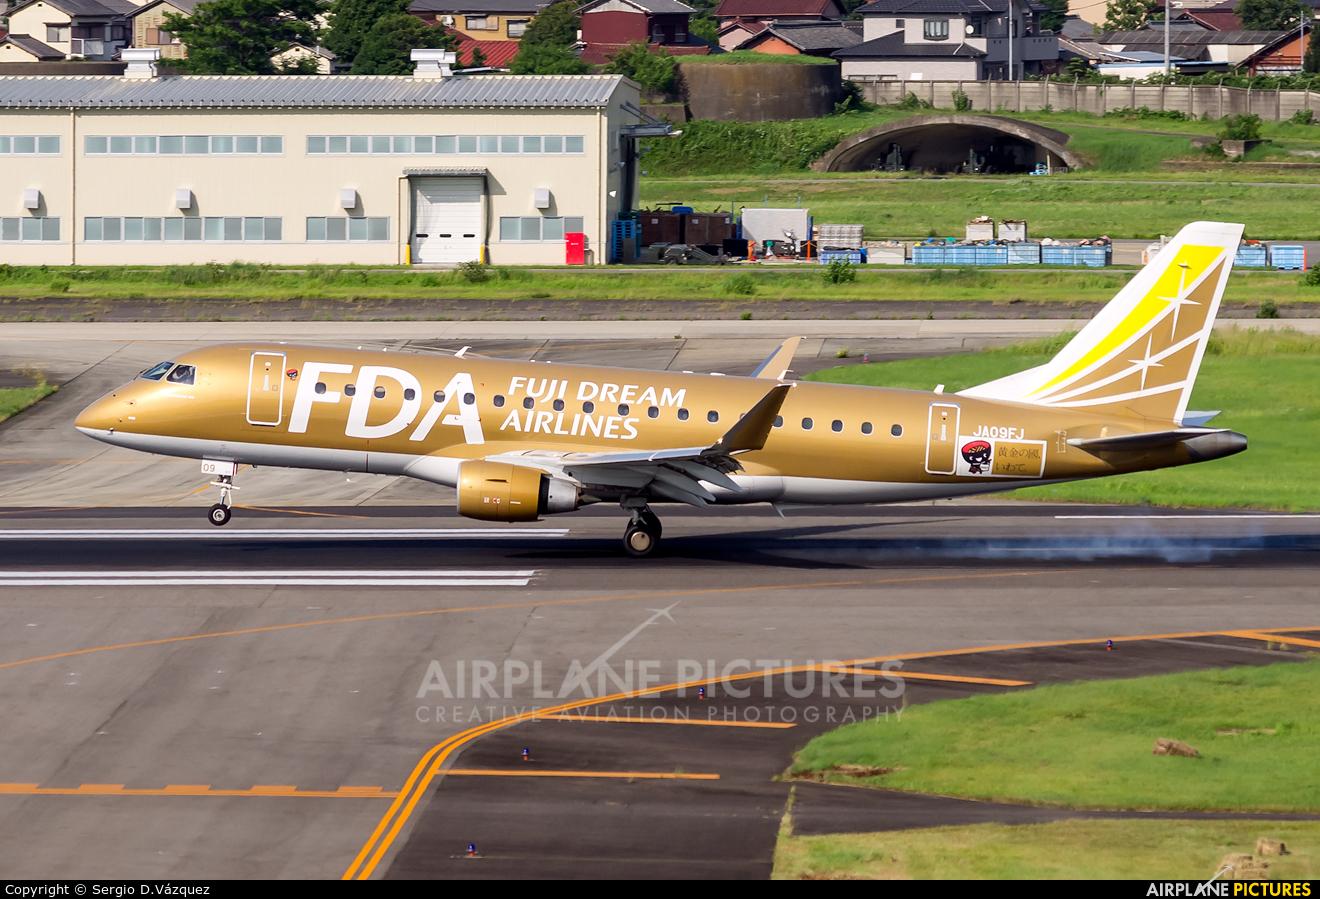 - Airport Overview JA09FJ aircraft at Nagoya - Komaki AB